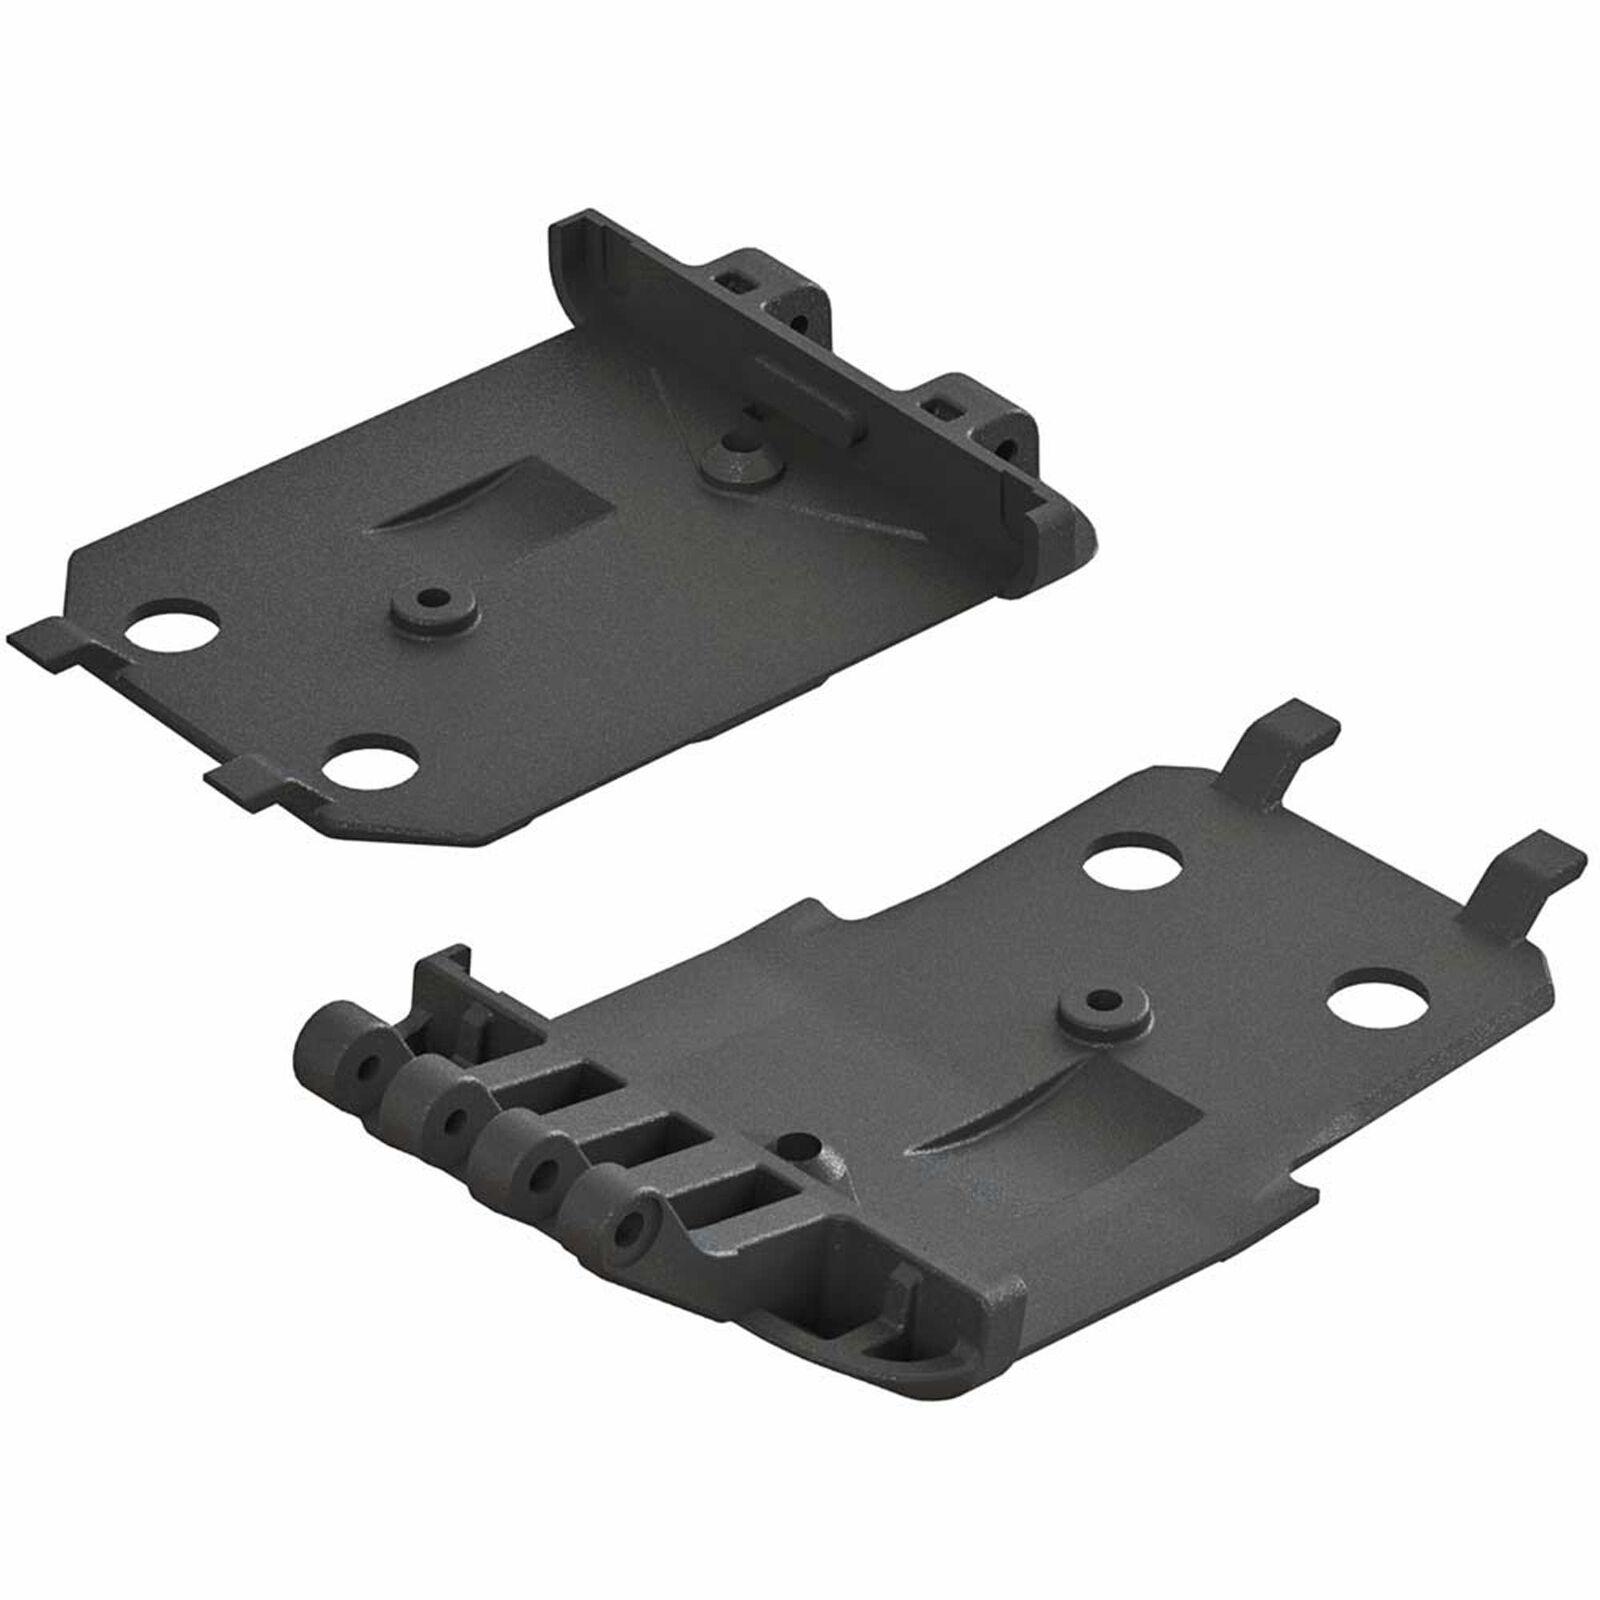 F/R Lower Skidplate (2): 4x4 Senton Mega